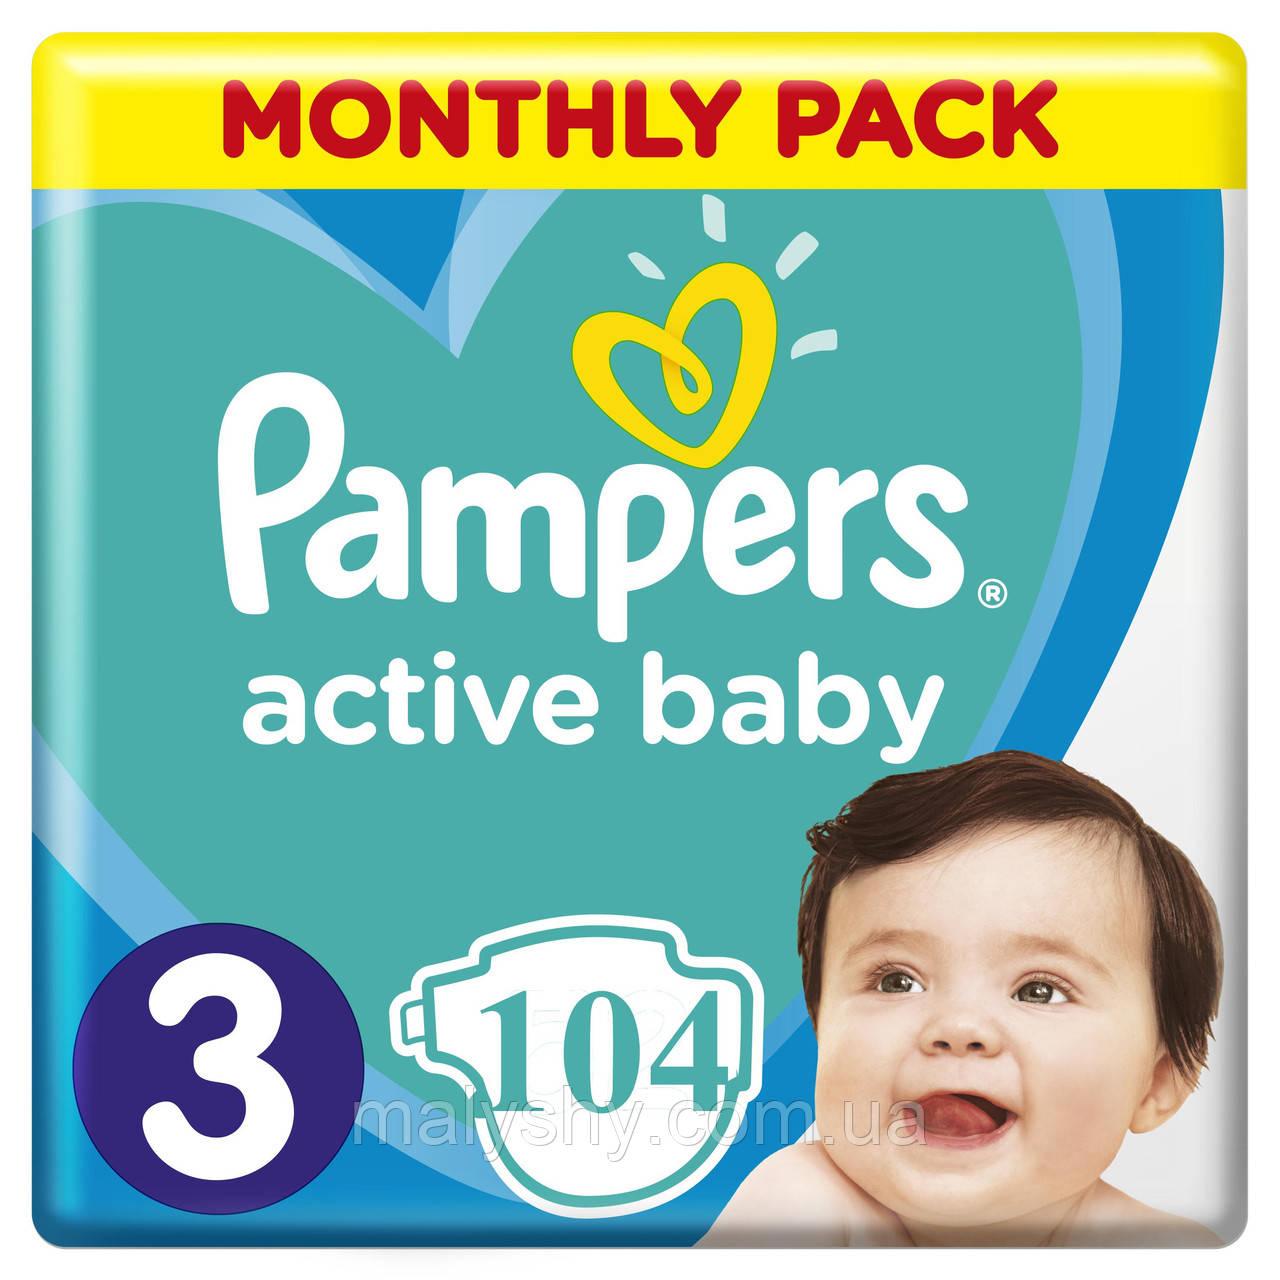 Подгузники Pampers Active Baby Размер 3 (Midi) 6-10 кг, 104 подгузника CPA